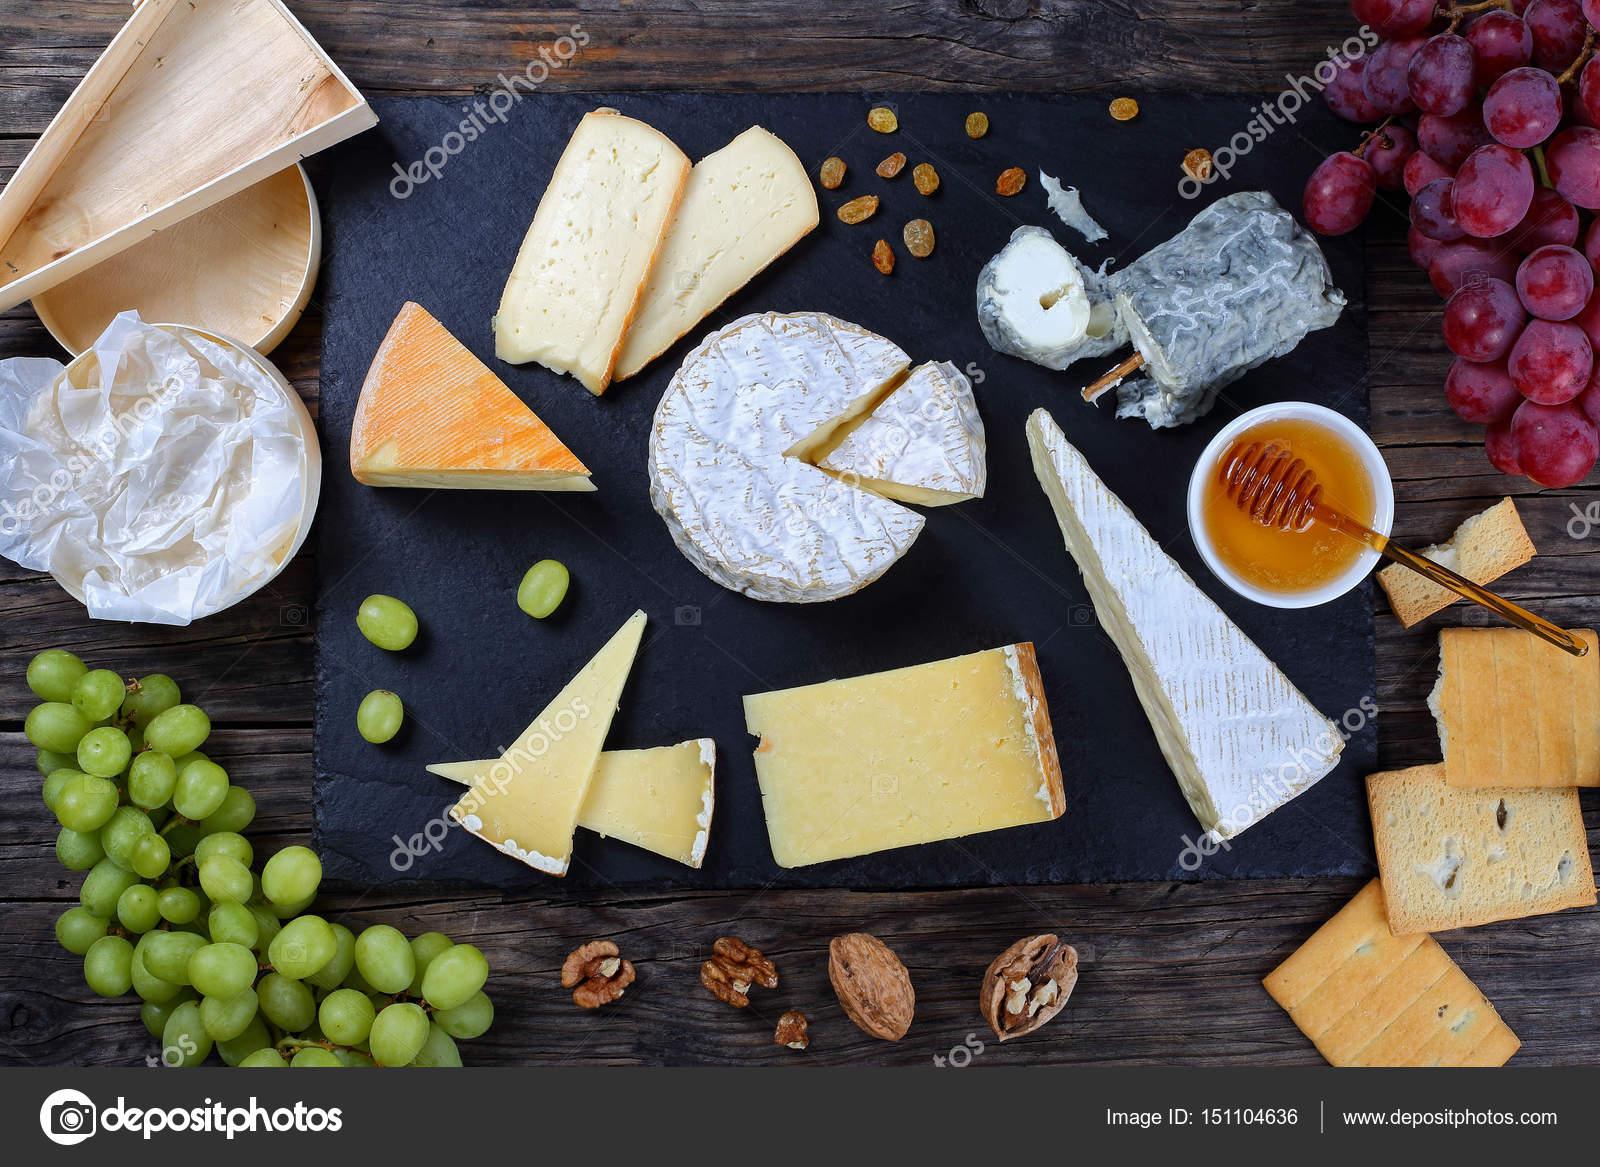 Authentic french Cheese plate top view \u2014 Stock Photo & authentic french Cheese plate top view \u2014 Stock Photo © zhupanova ...